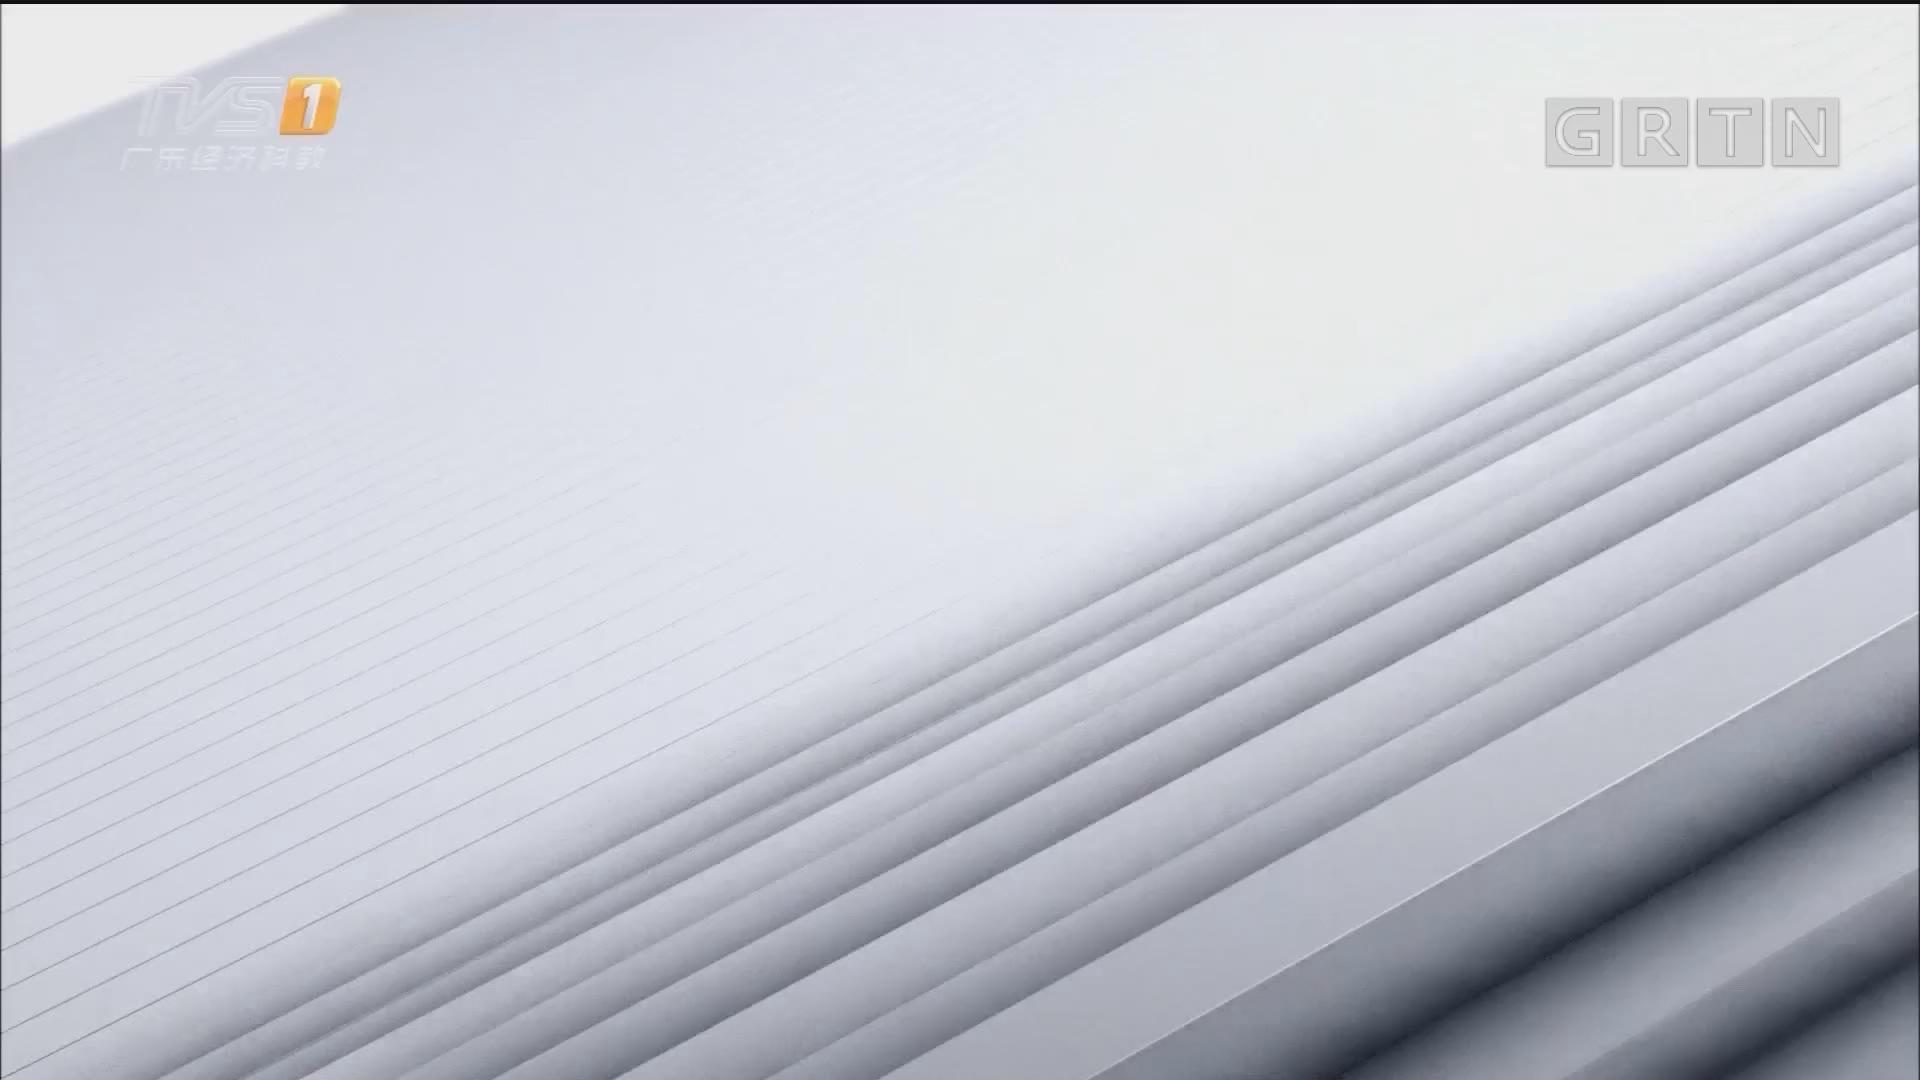 [HD][2019-06-16]南方财经报道:中俄博览会:搭起经贸合作的桥梁